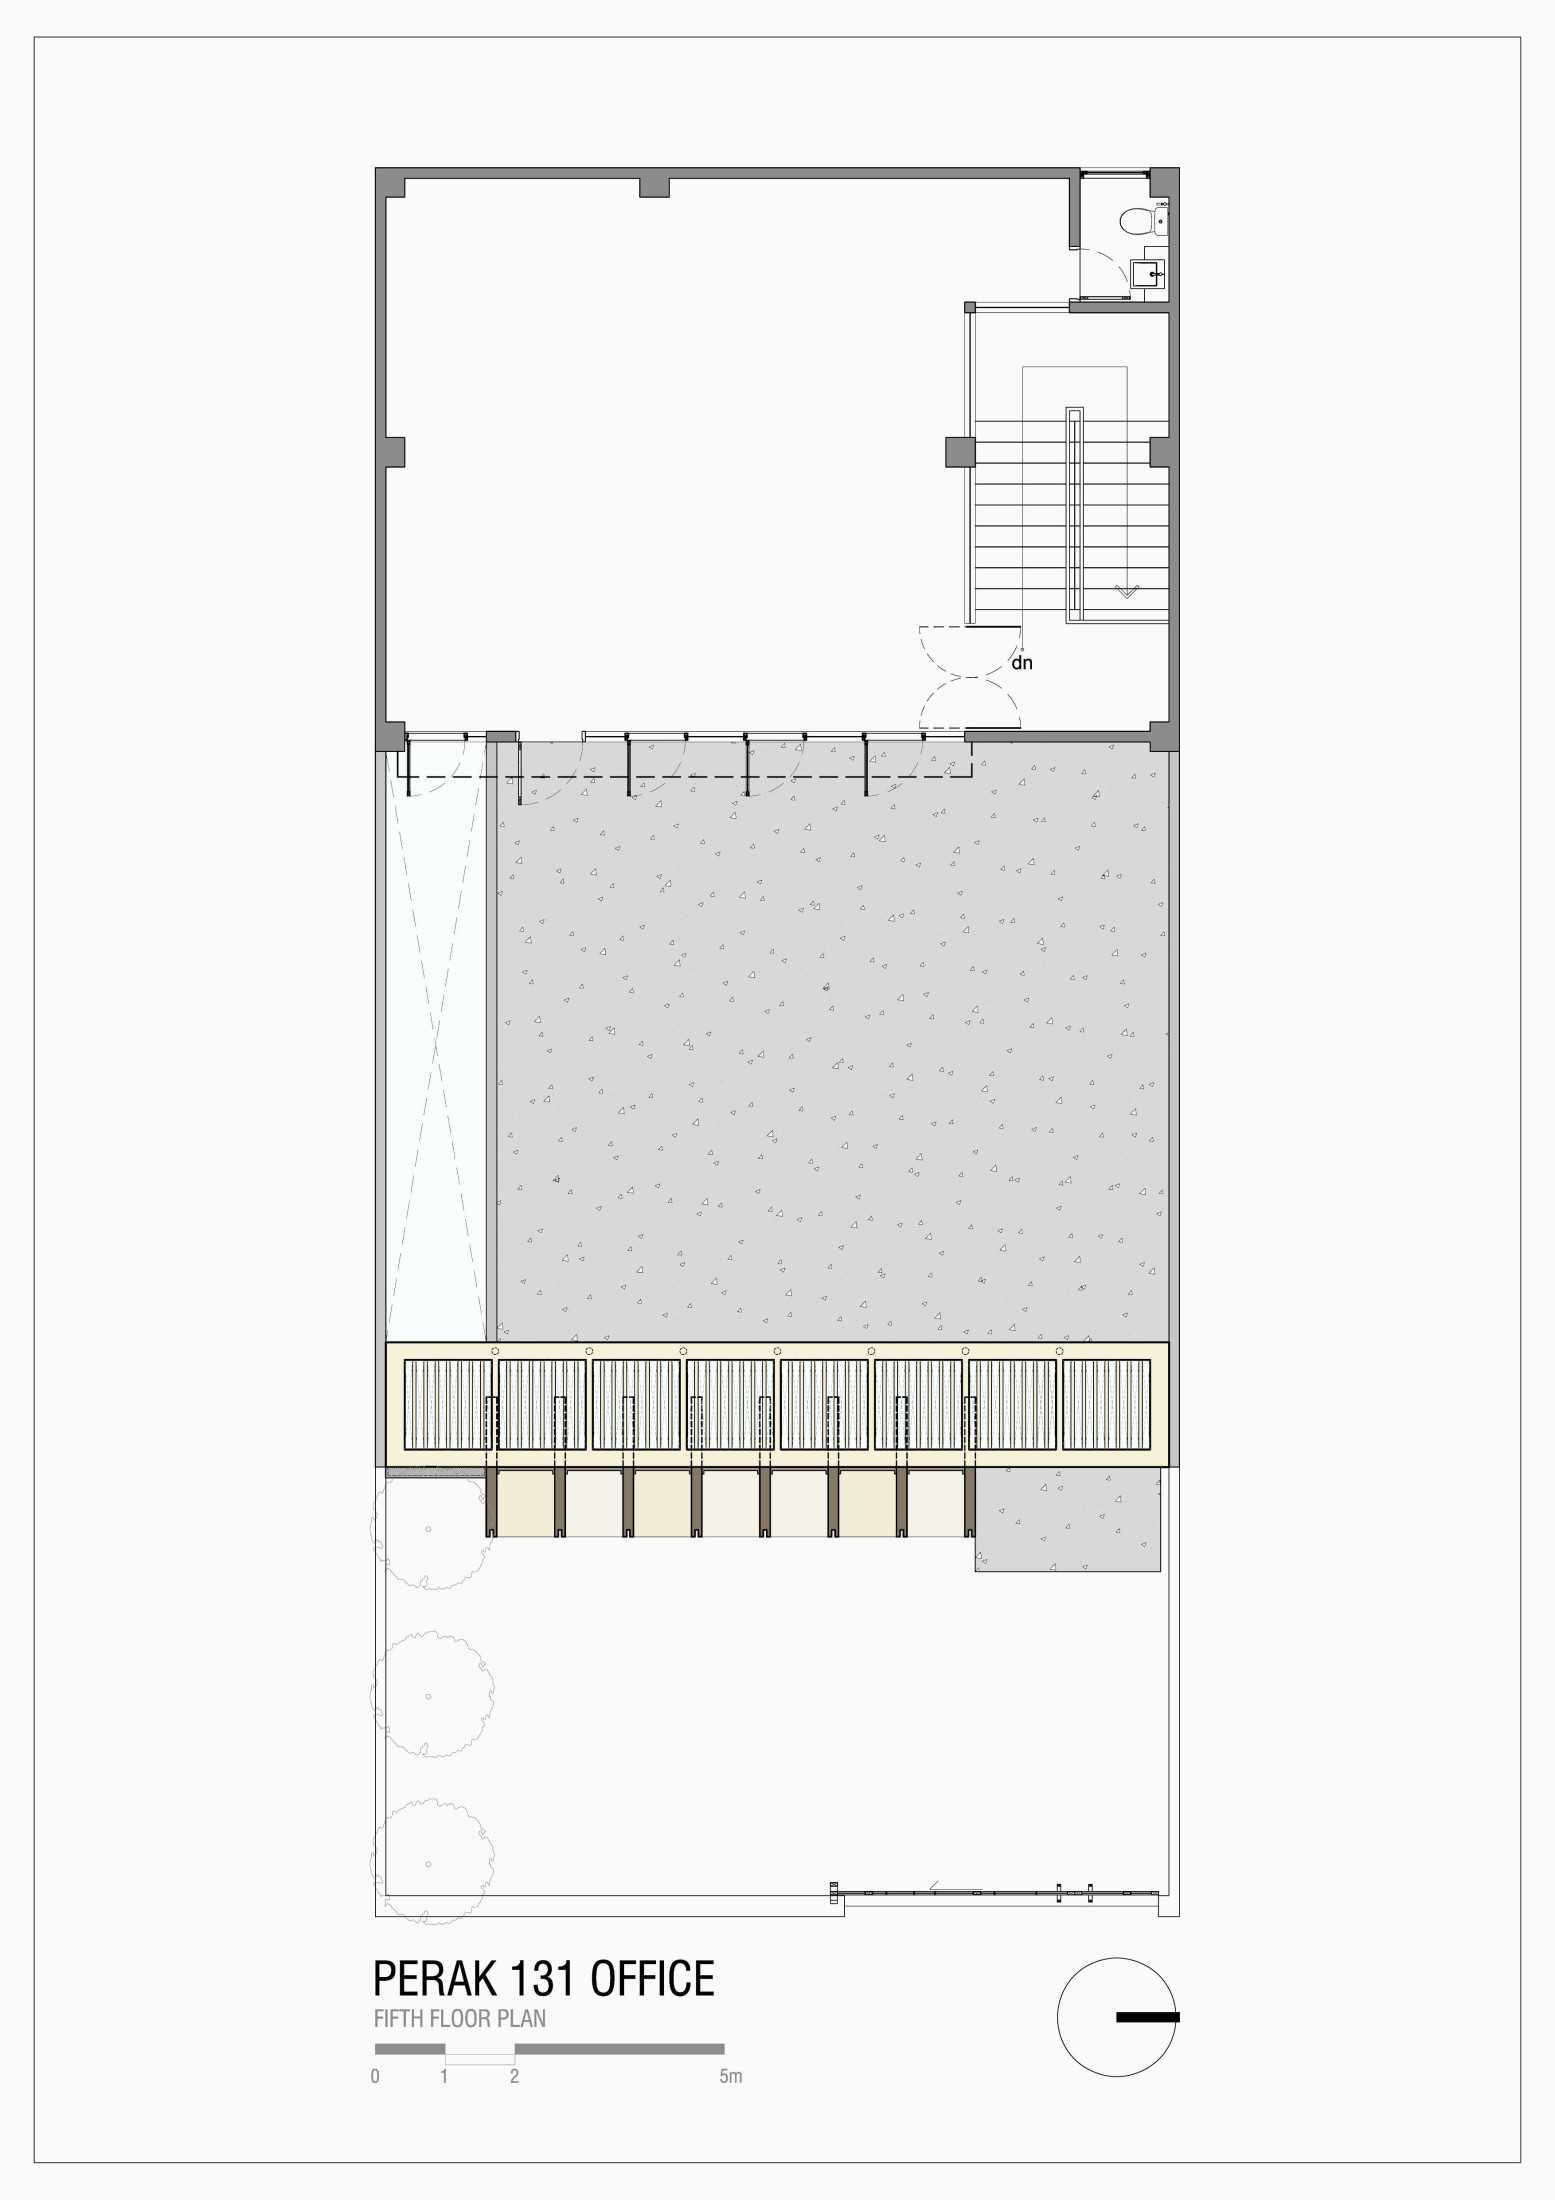 Simple Projects Architecture Pb131 Office Jl.perak Barat 131, Surabaya - Indonesia Jl.perak Barat 131, Surabaya - Indonesia Simple-Projects-Architecture-Pb131-Office  59151